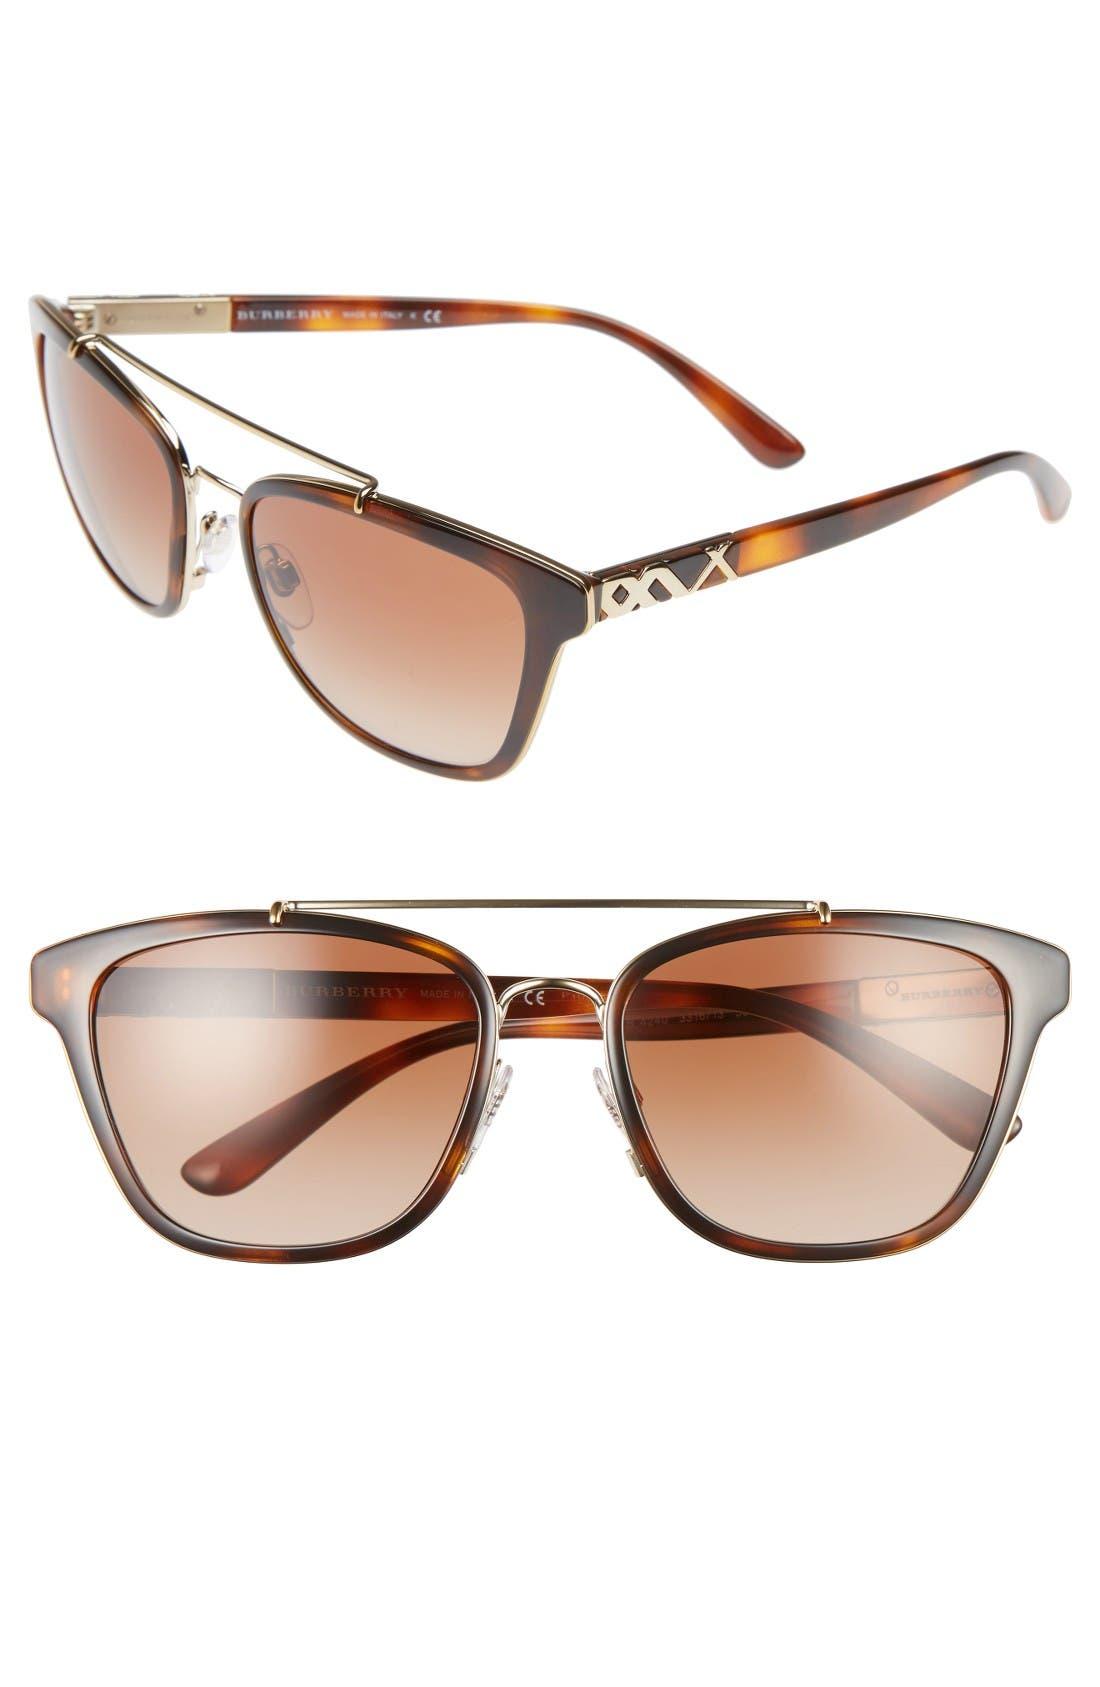 Burberry 56mm Sunglasses